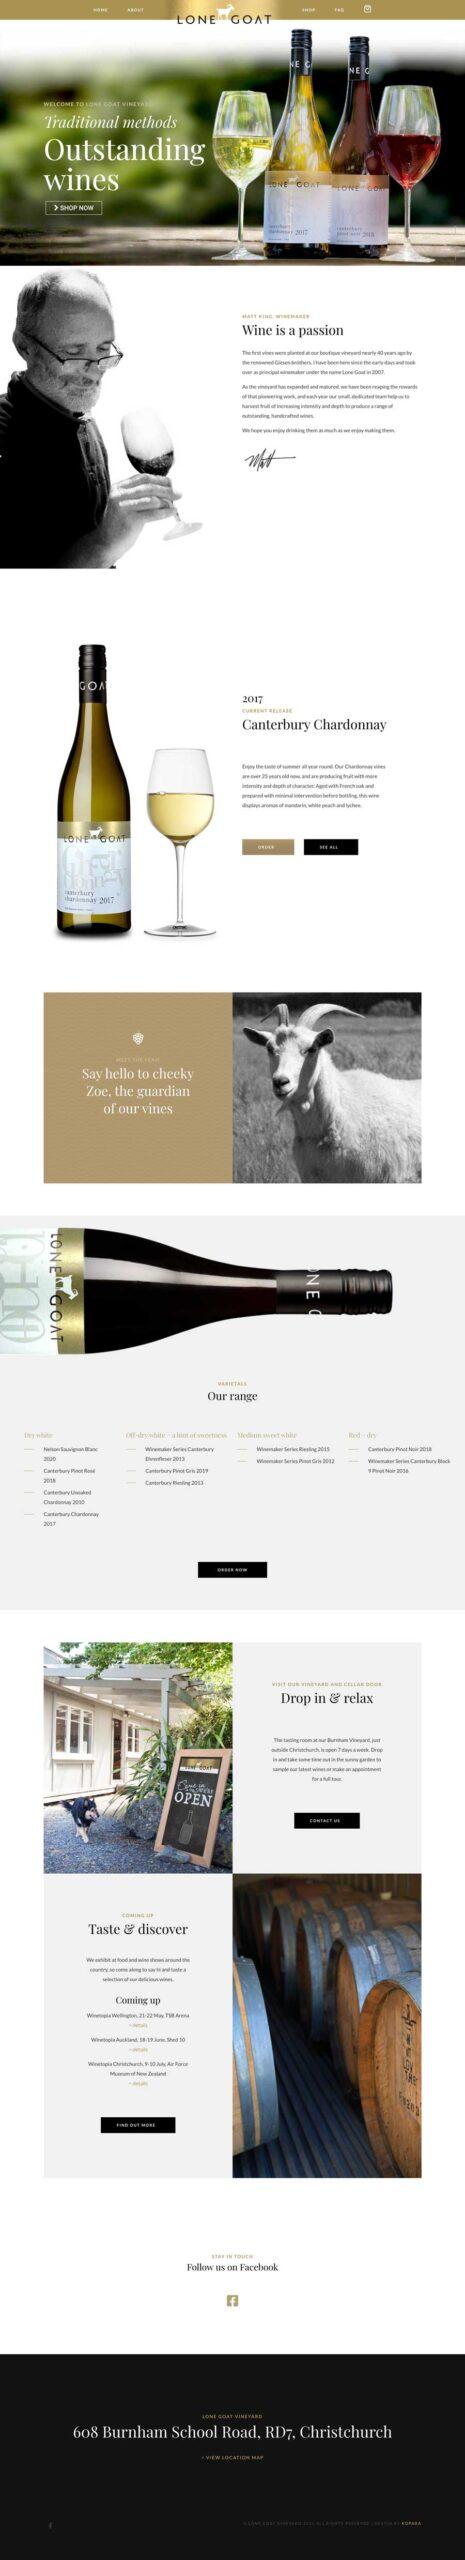 Lone Goat Vineyard Website Design and Marketing